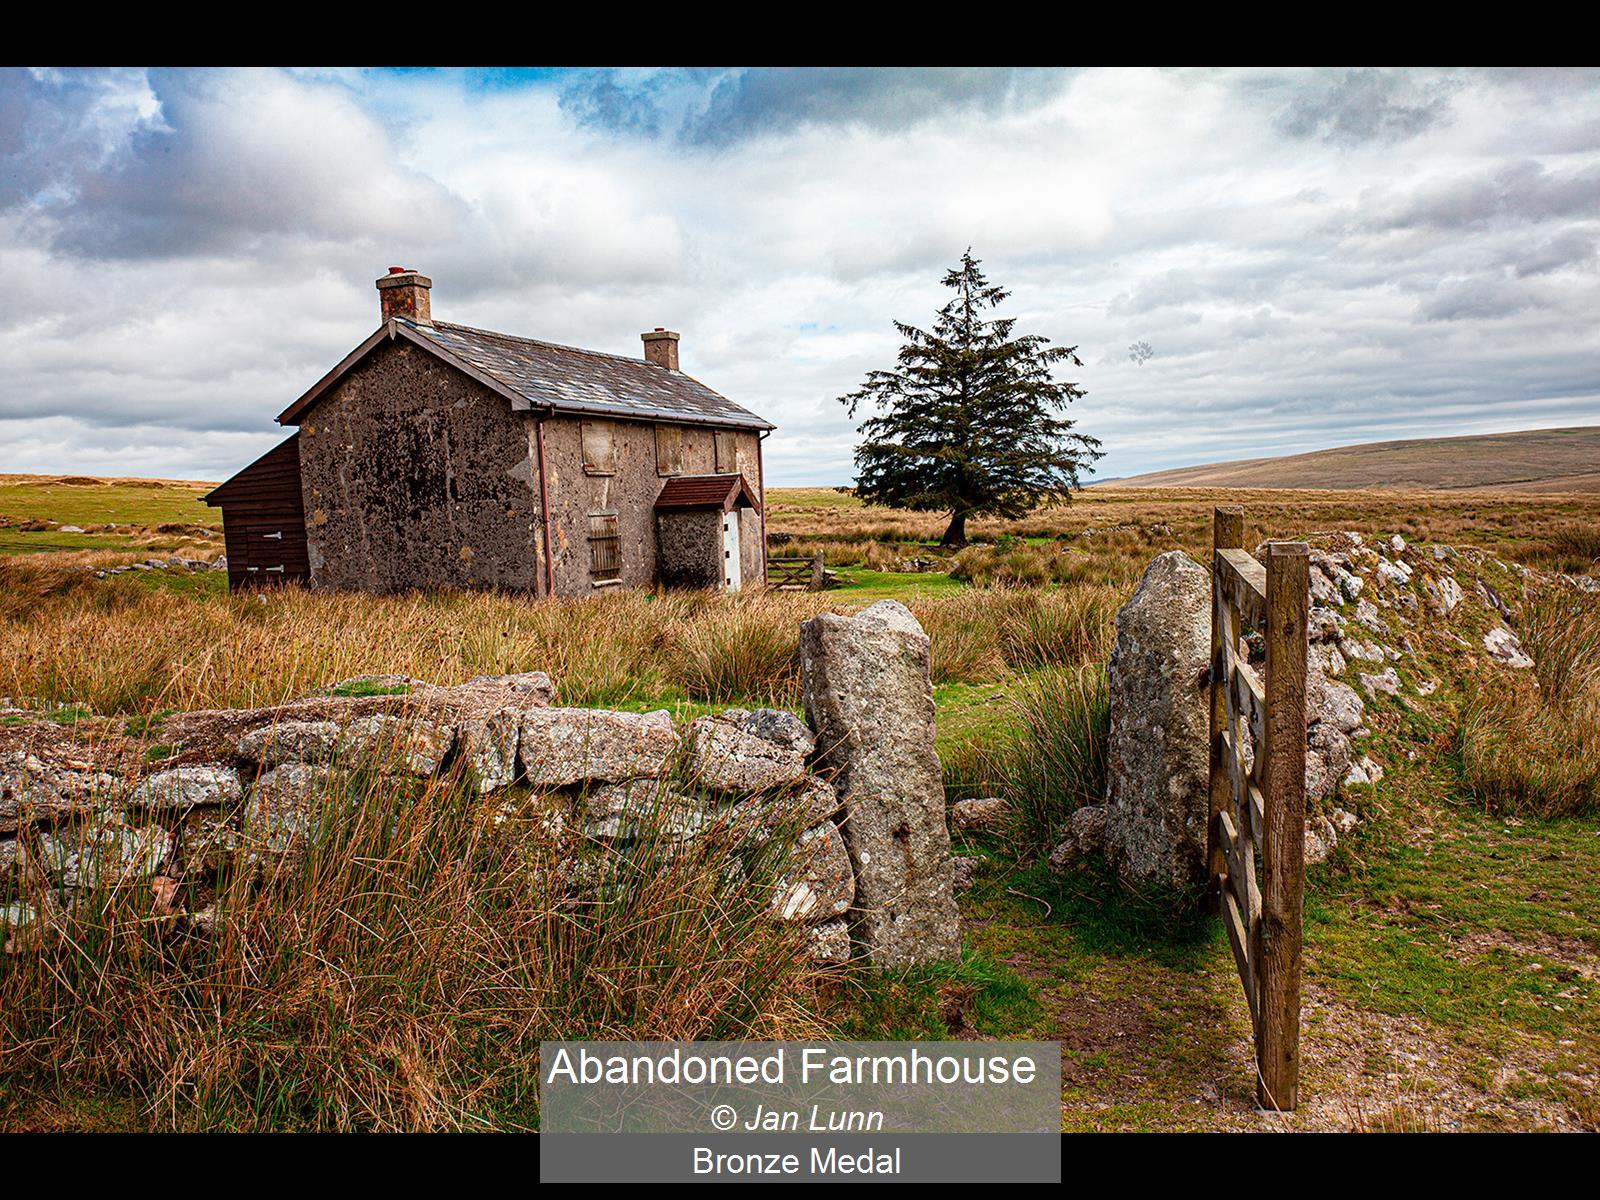 Abandoned Farmhouse_Jan Lunn_Bronze